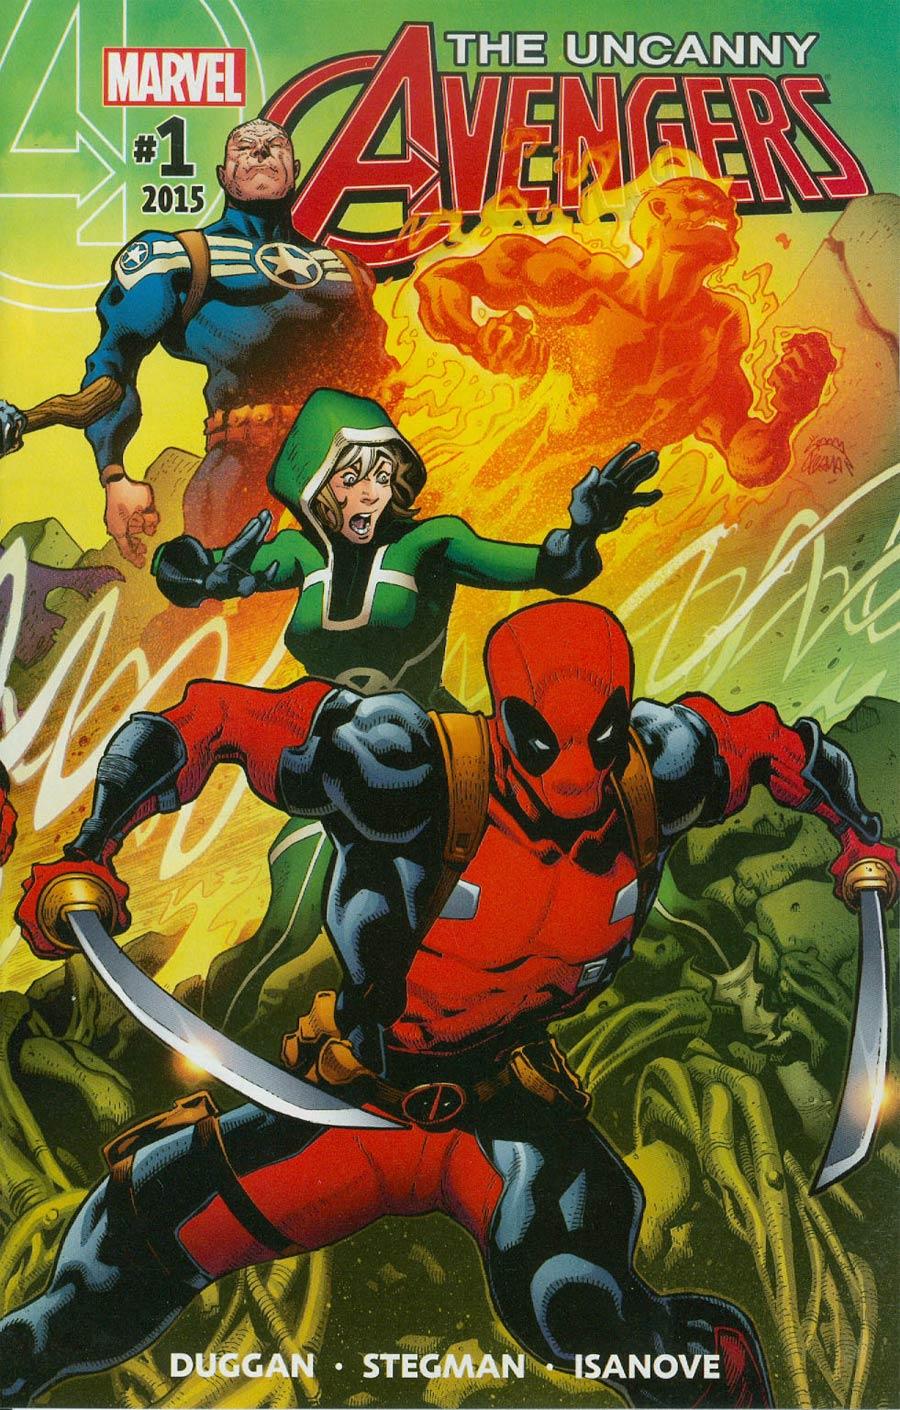 Uncanny Avengers Vol 3 #1 Cover A Regular Ryan Stegman Cover